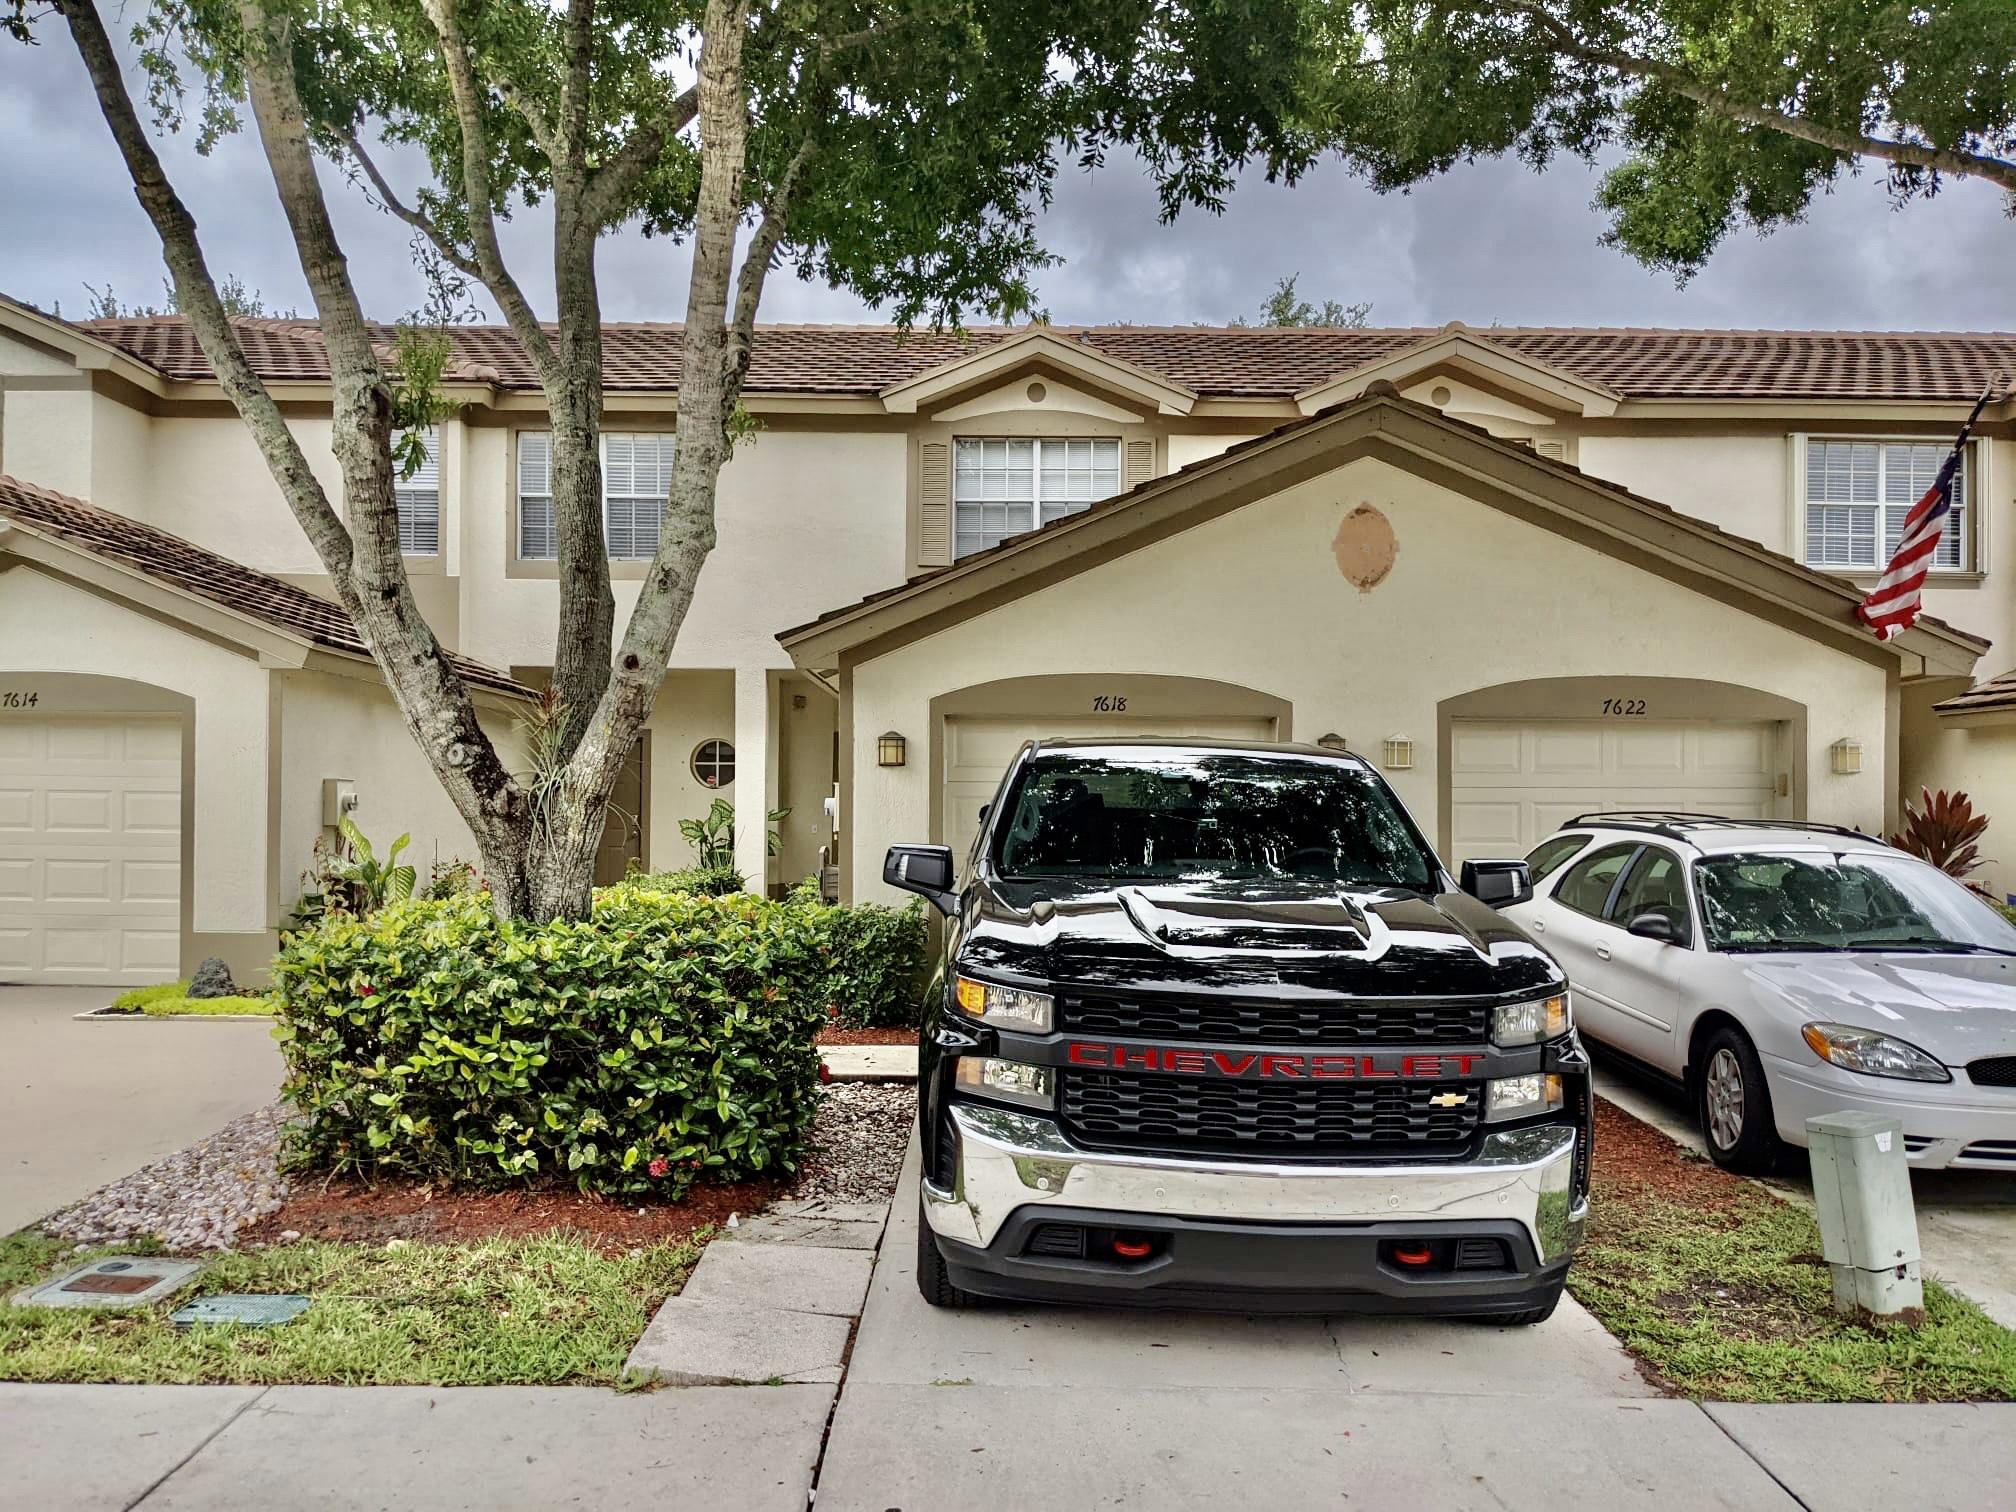 7618 Sonesta Shores Drive, Lake Worth, FL 33463